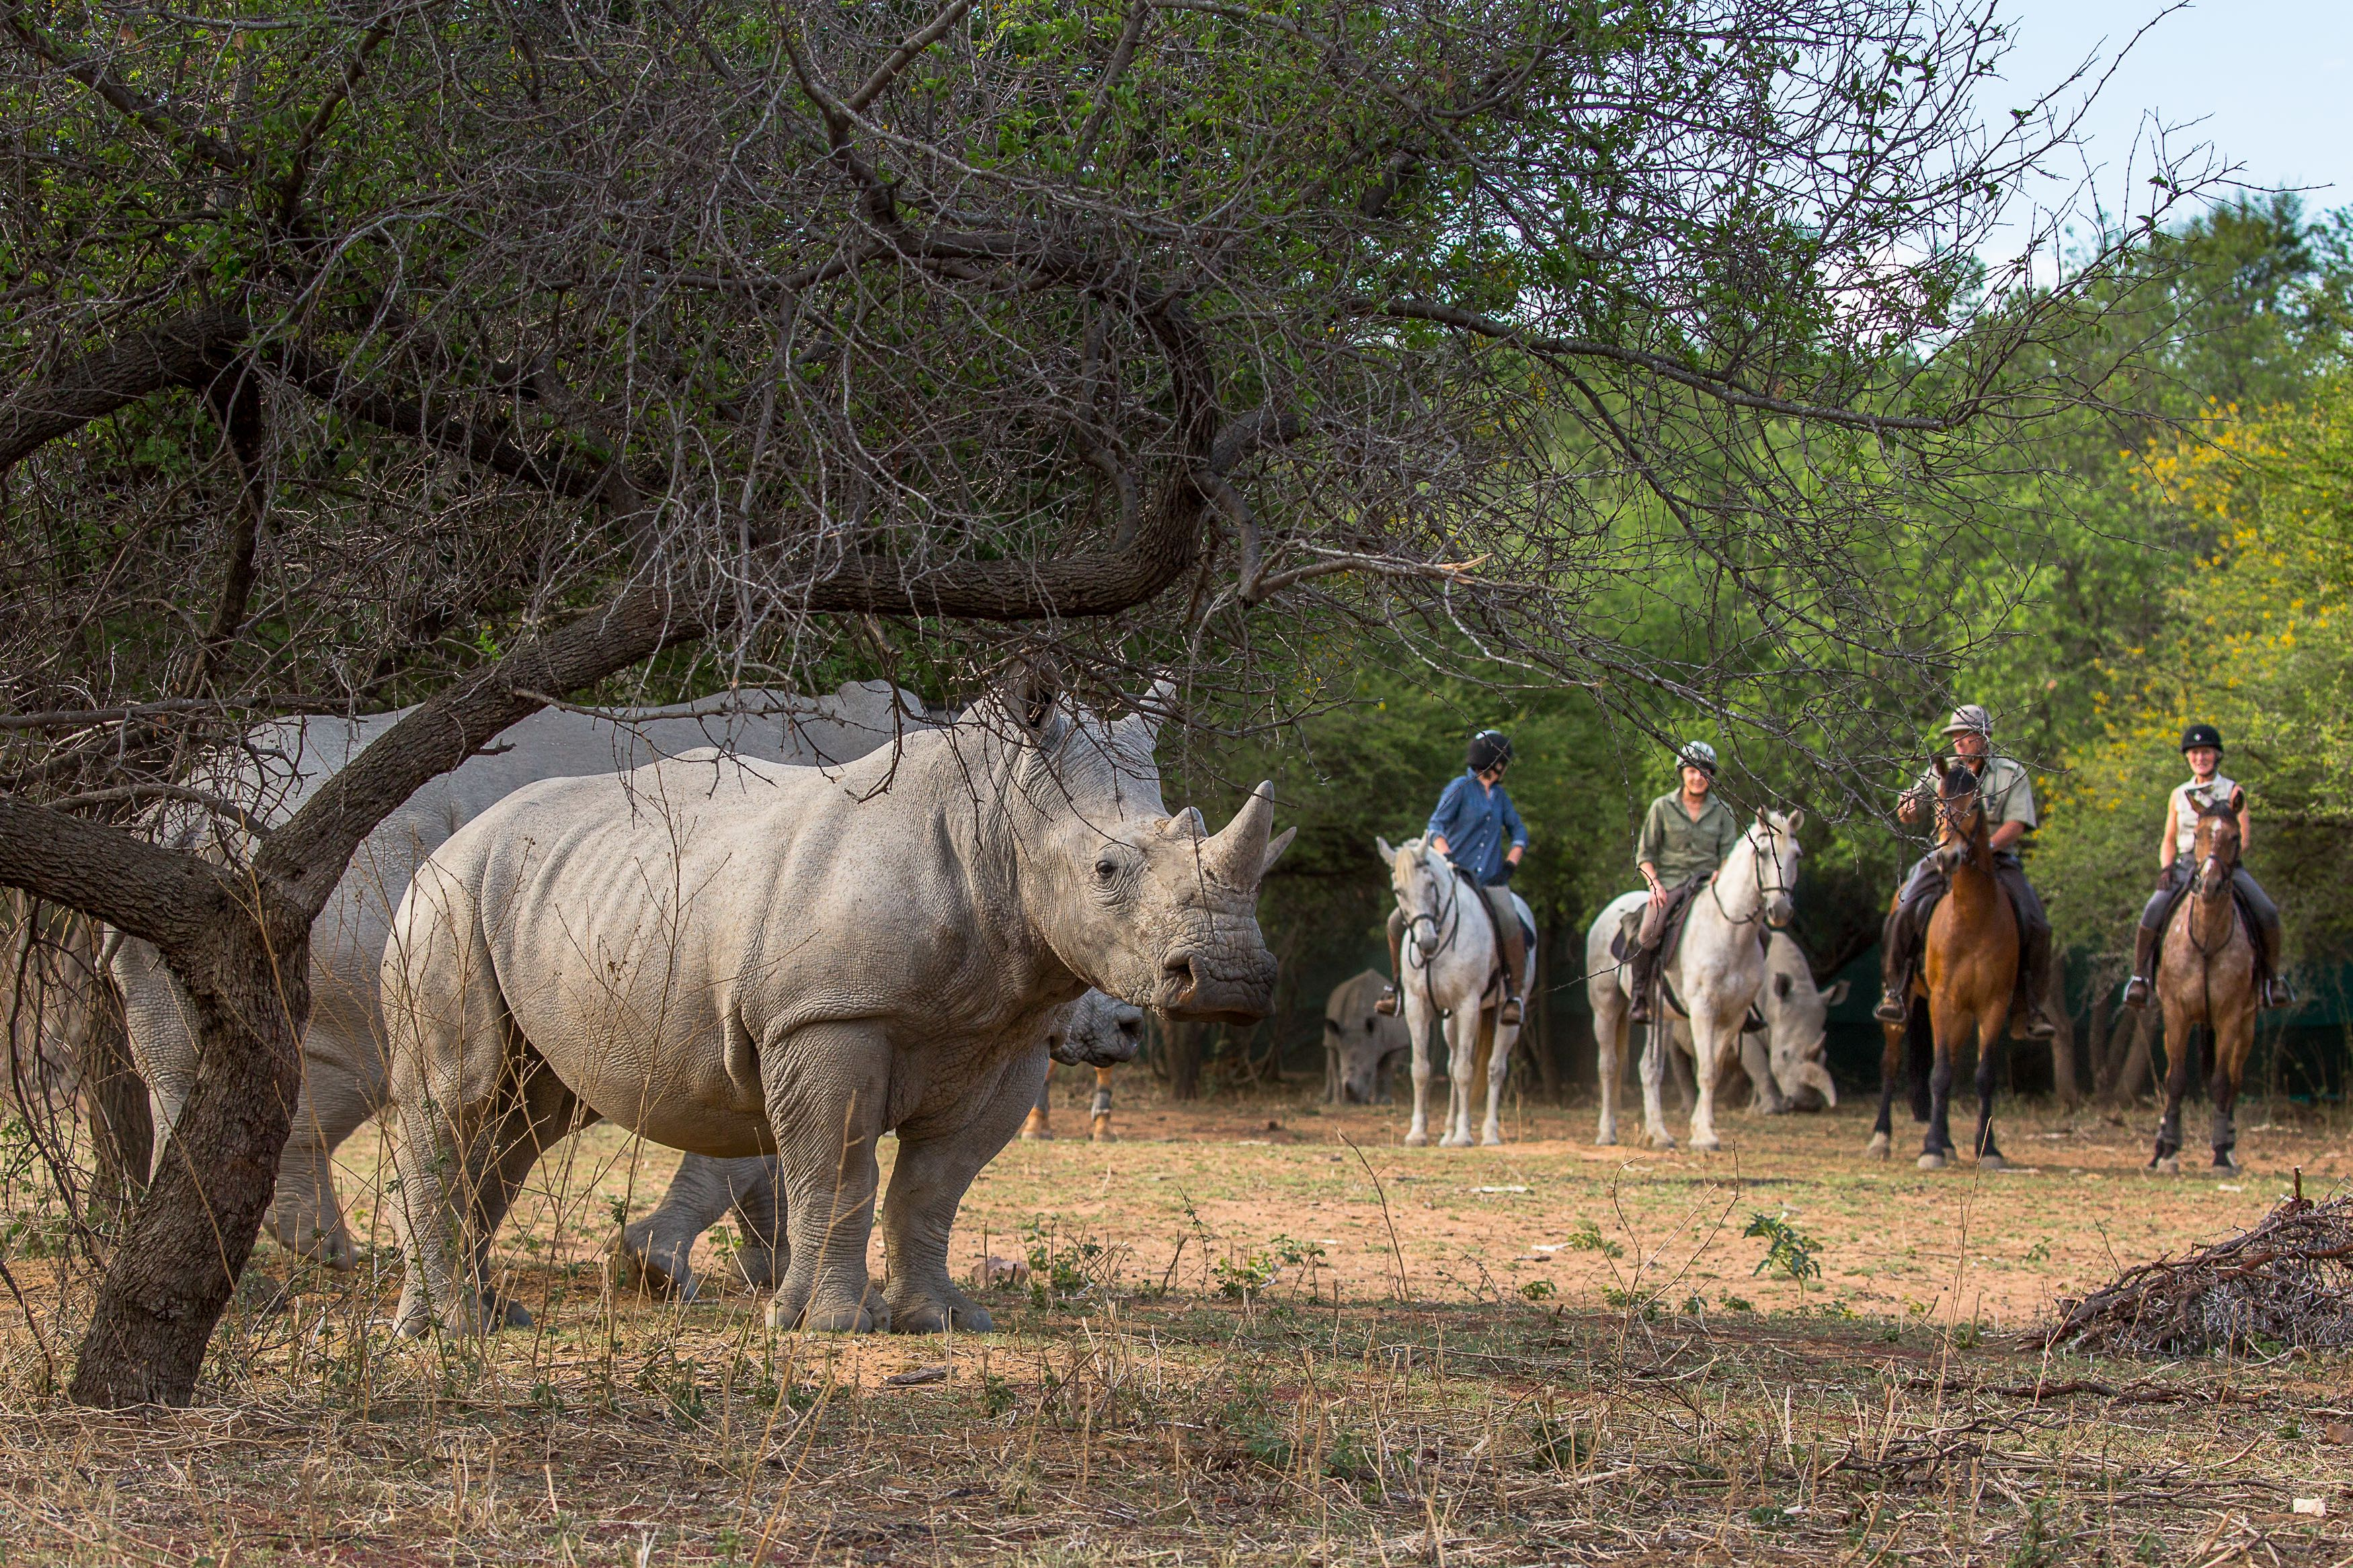 Chomping at the Bit for a Horseback Safari